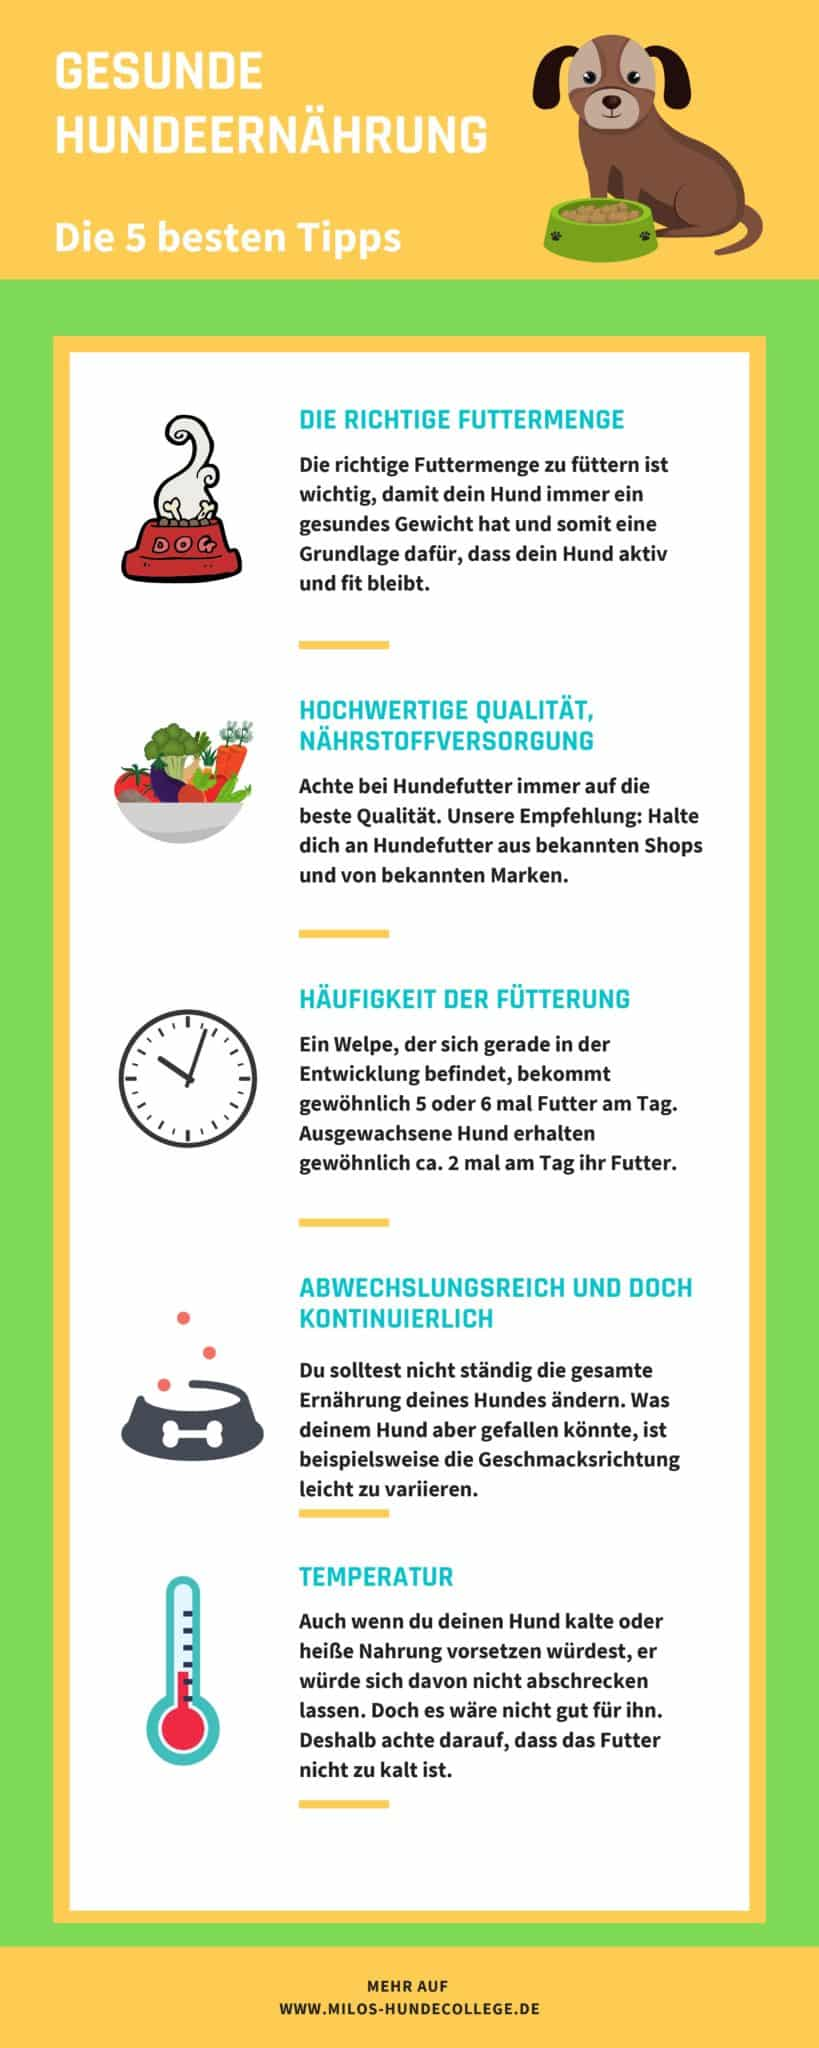 5 Tipps zur gesunden Hundeernährung